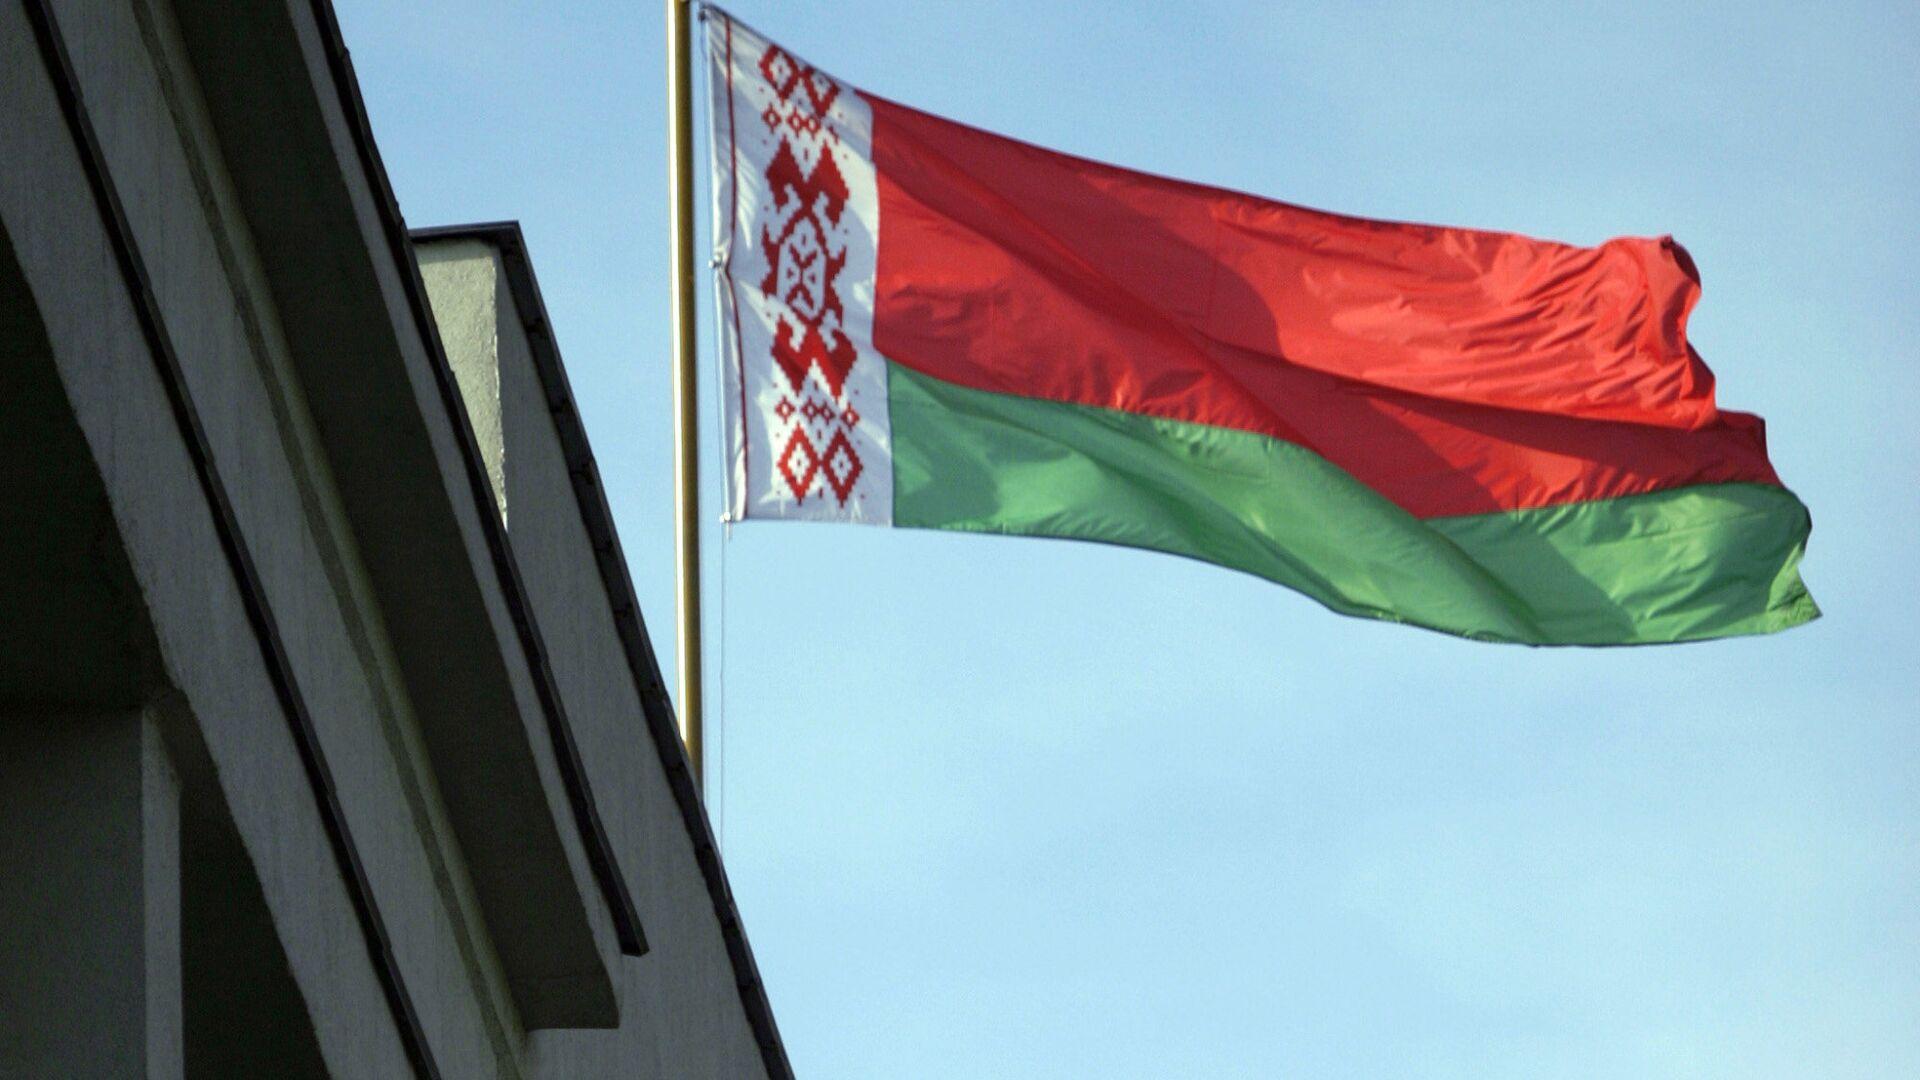 Bandera de Bielorrusia - Sputnik Mundo, 1920, 11.08.2021